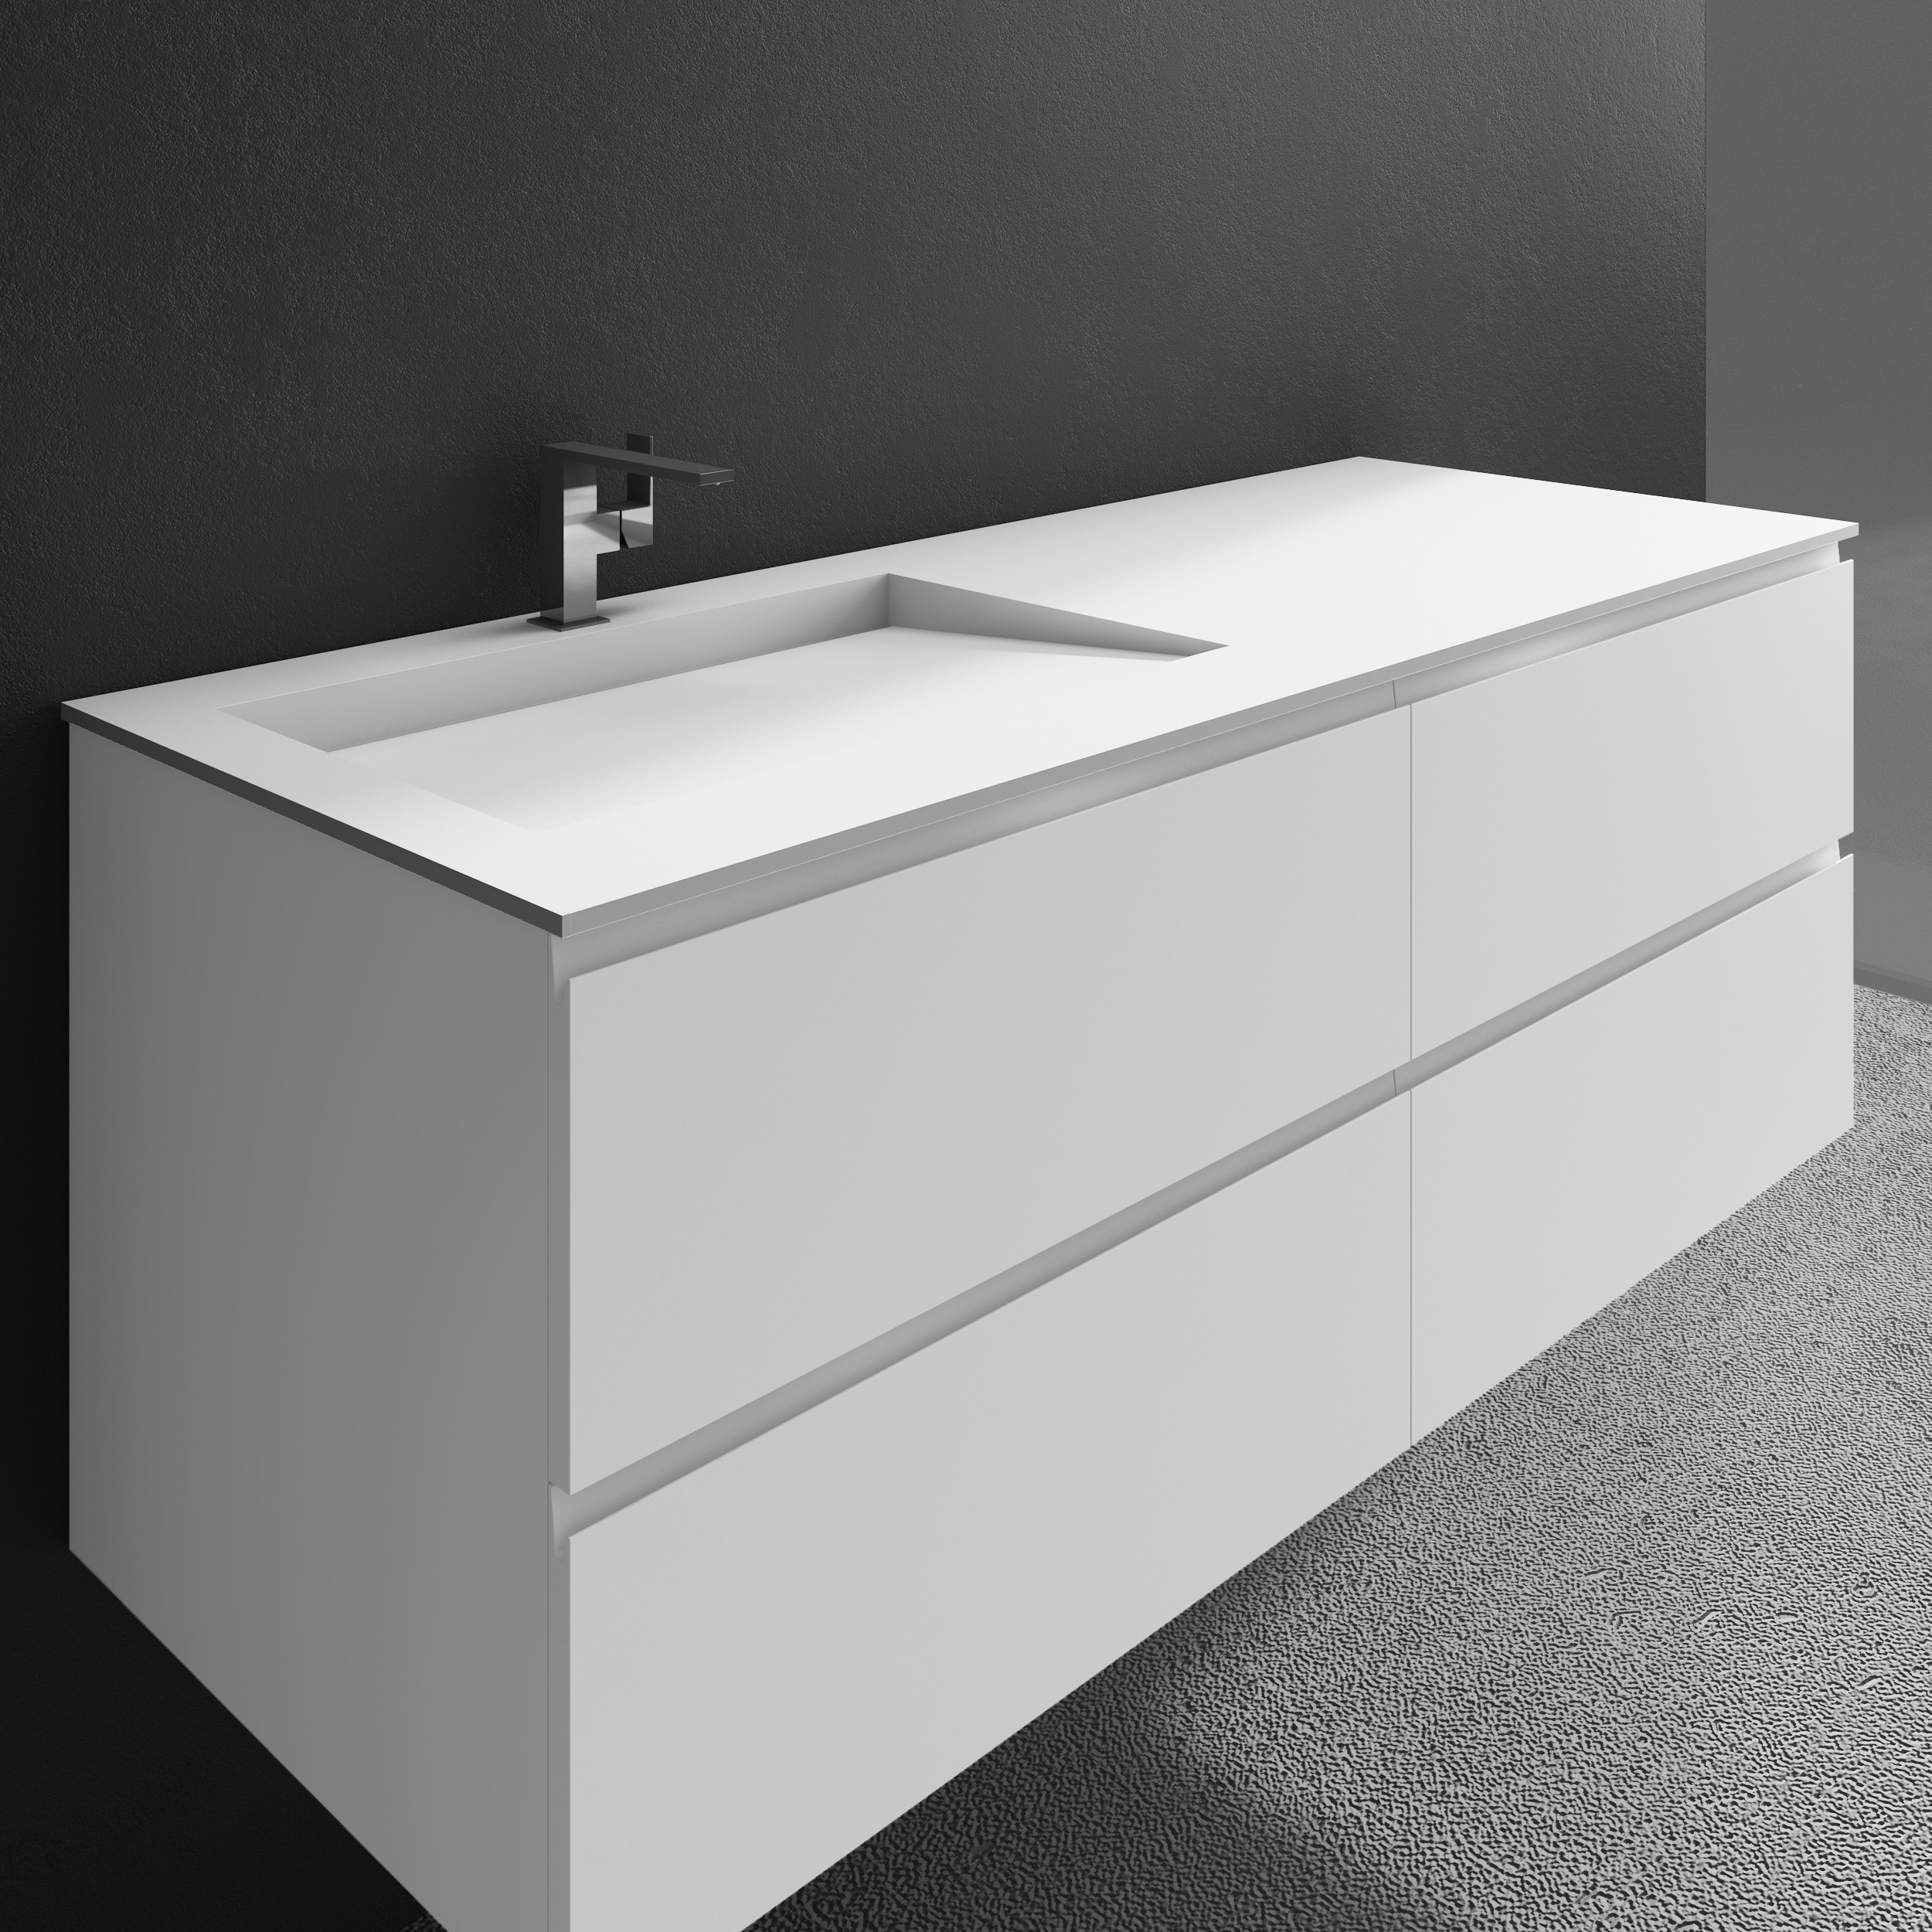 dupont corian waschtische umblendetes. Black Bedroom Furniture Sets. Home Design Ideas